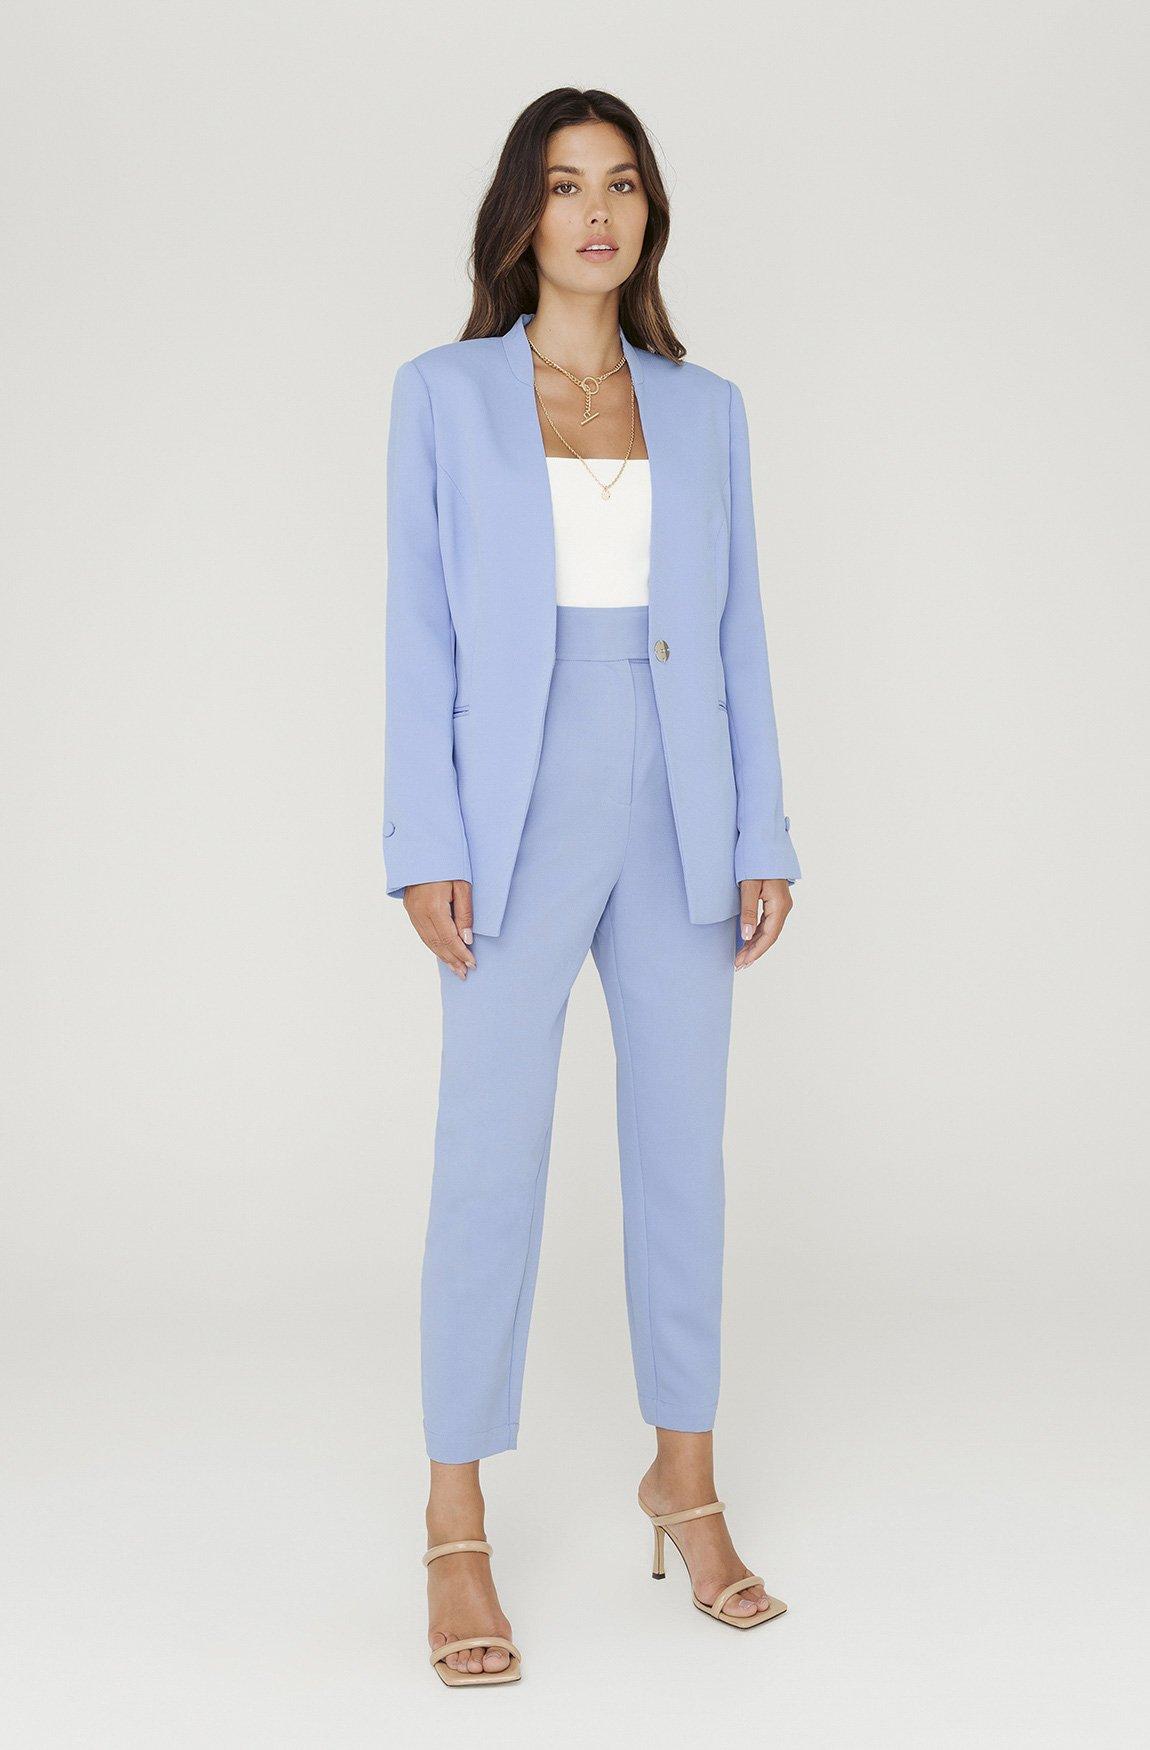 sheike-charlize-jacket-blue_1002367_2_1200x